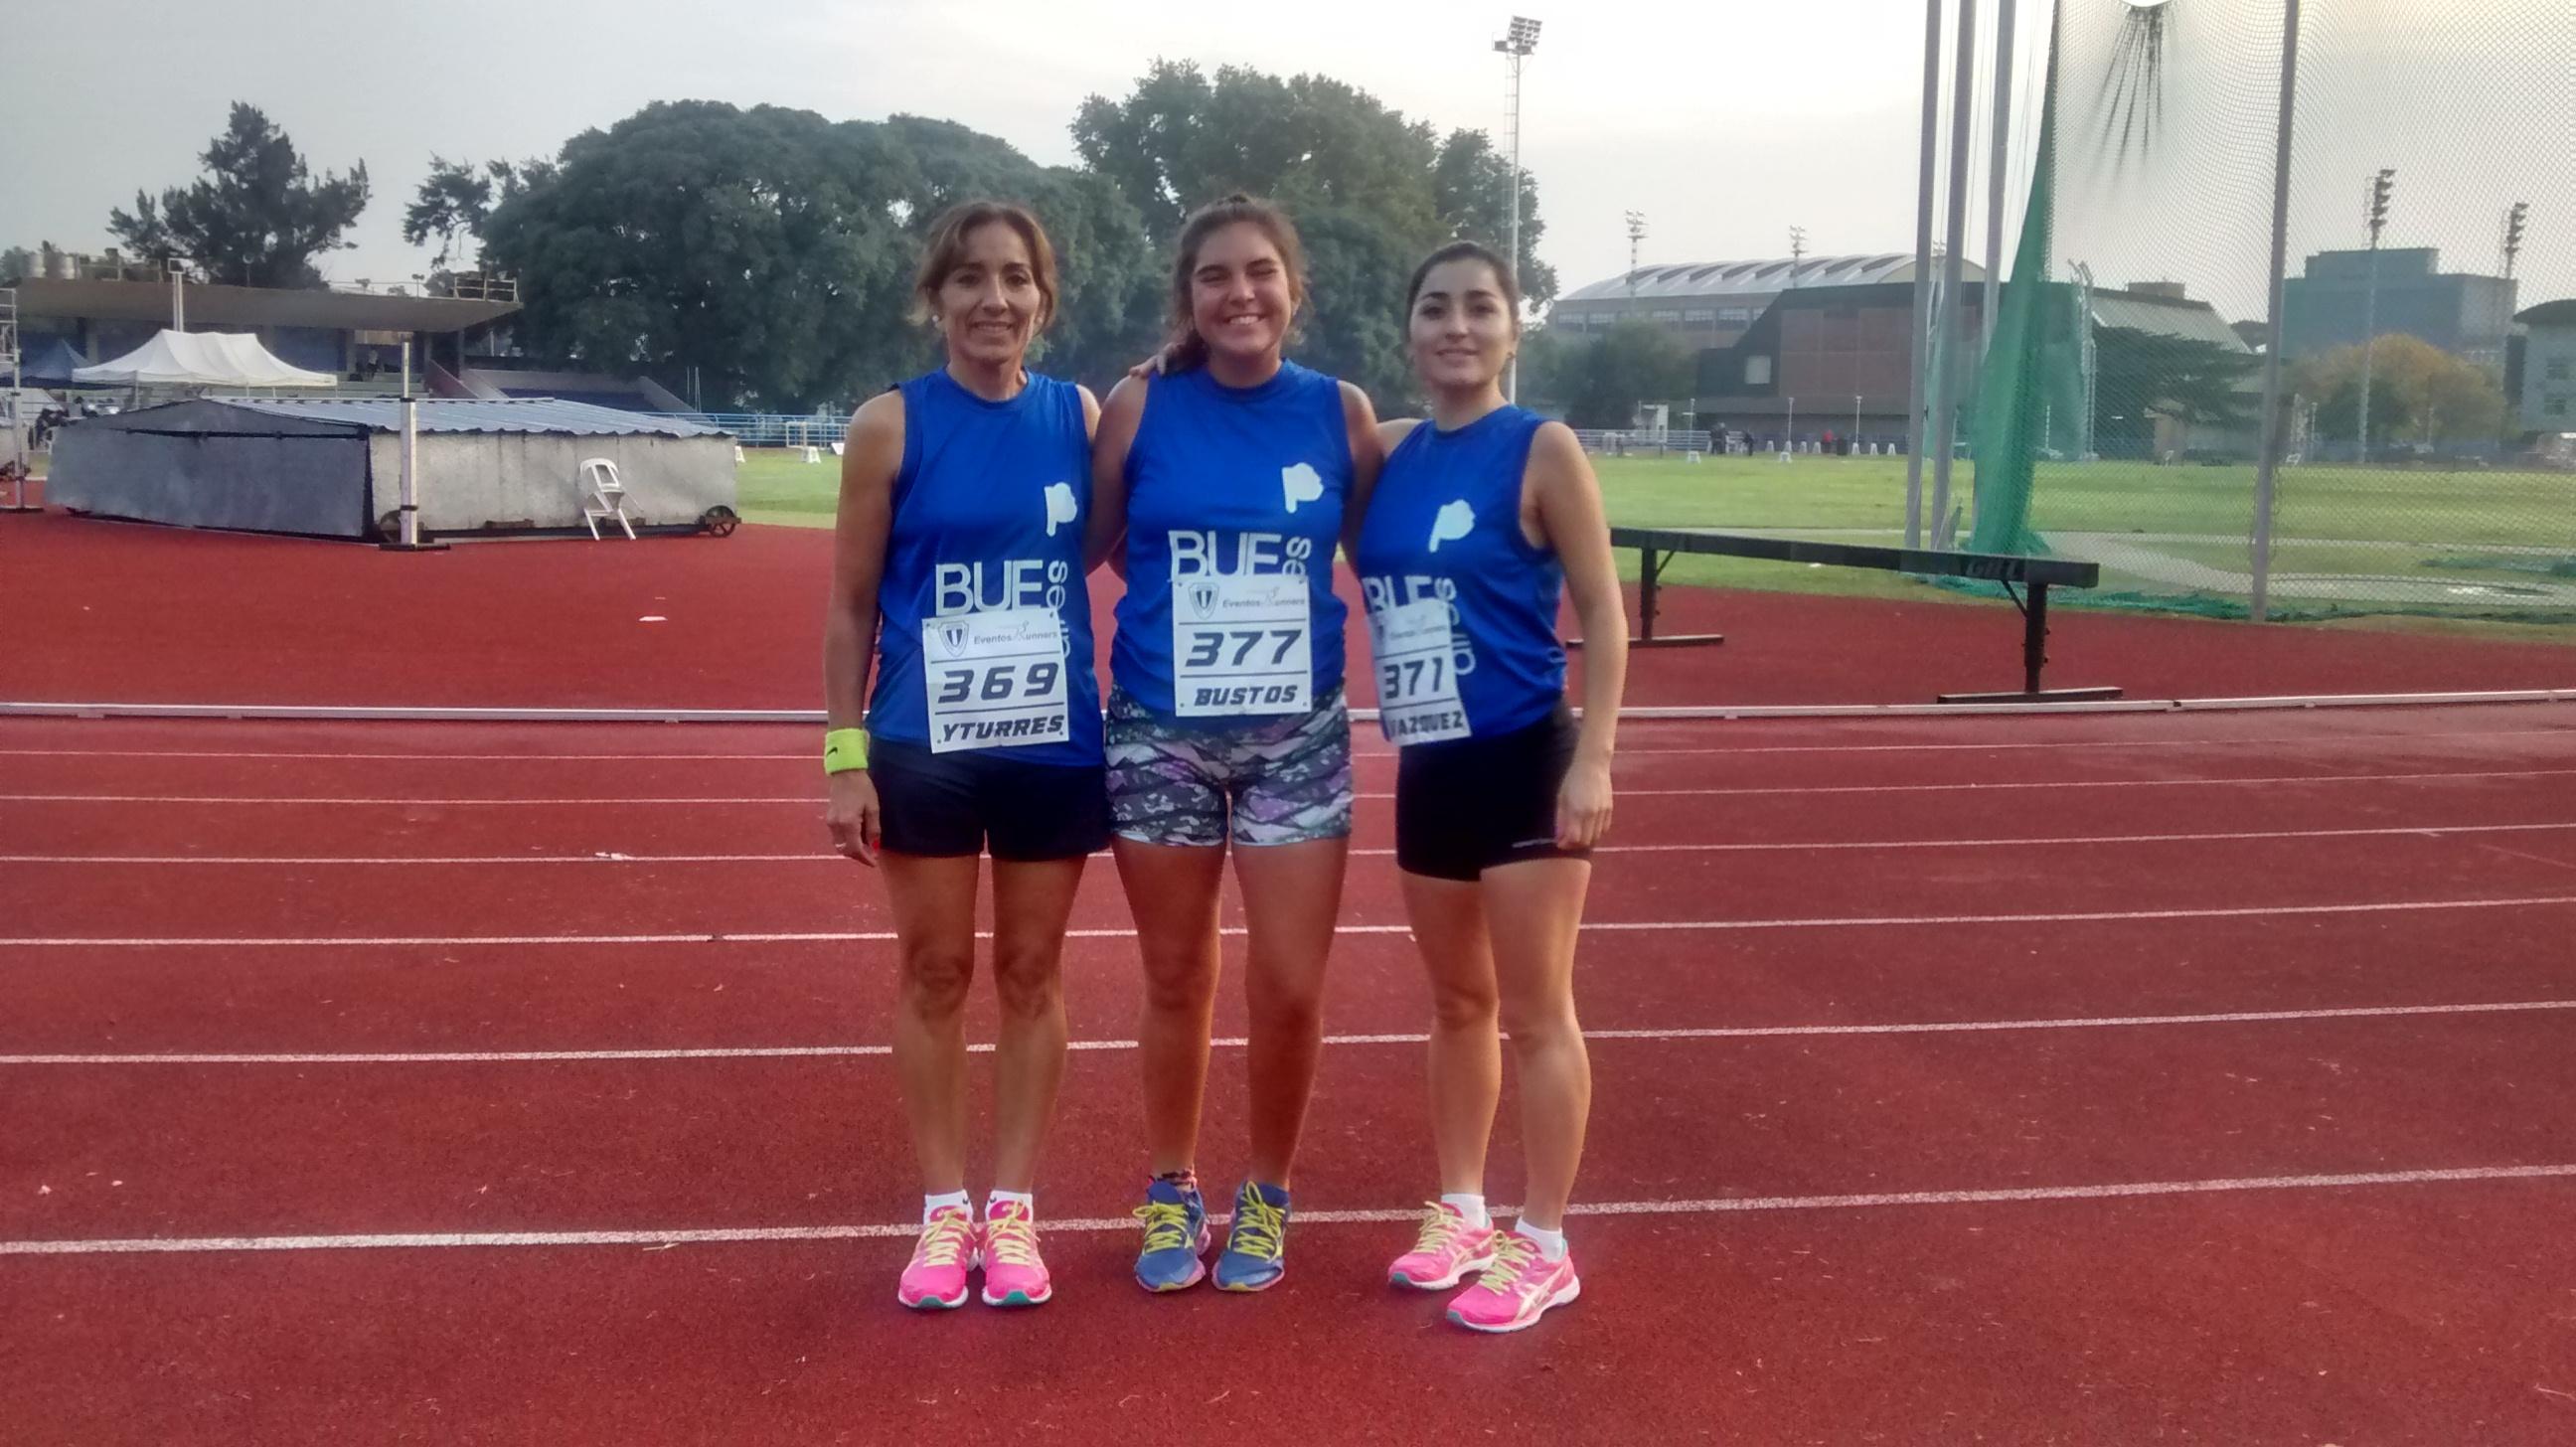 Las Tres participantes Tandilenses en Marcha 10.000 metros.